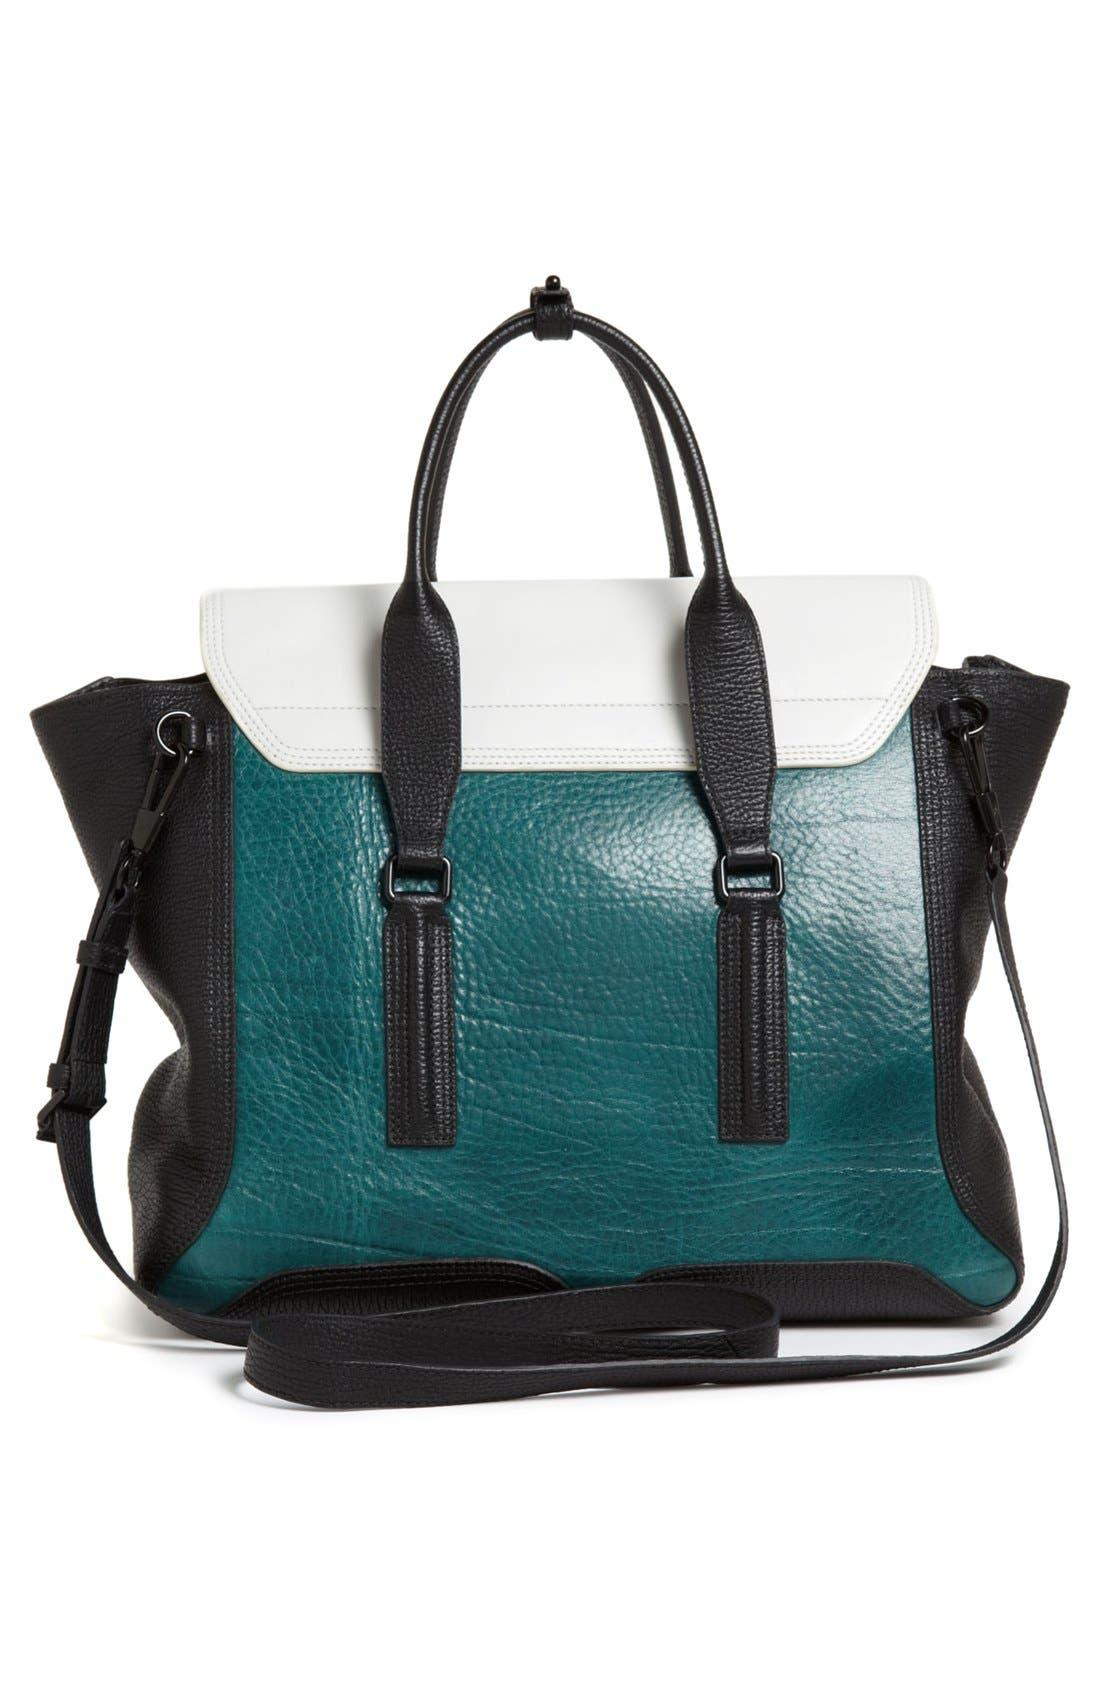 Alternate Image 4  - 3.1 Phillip Lim 'Pashli' Colorblock Leather Crossbody Satchel (Nordstrom Exclusive)